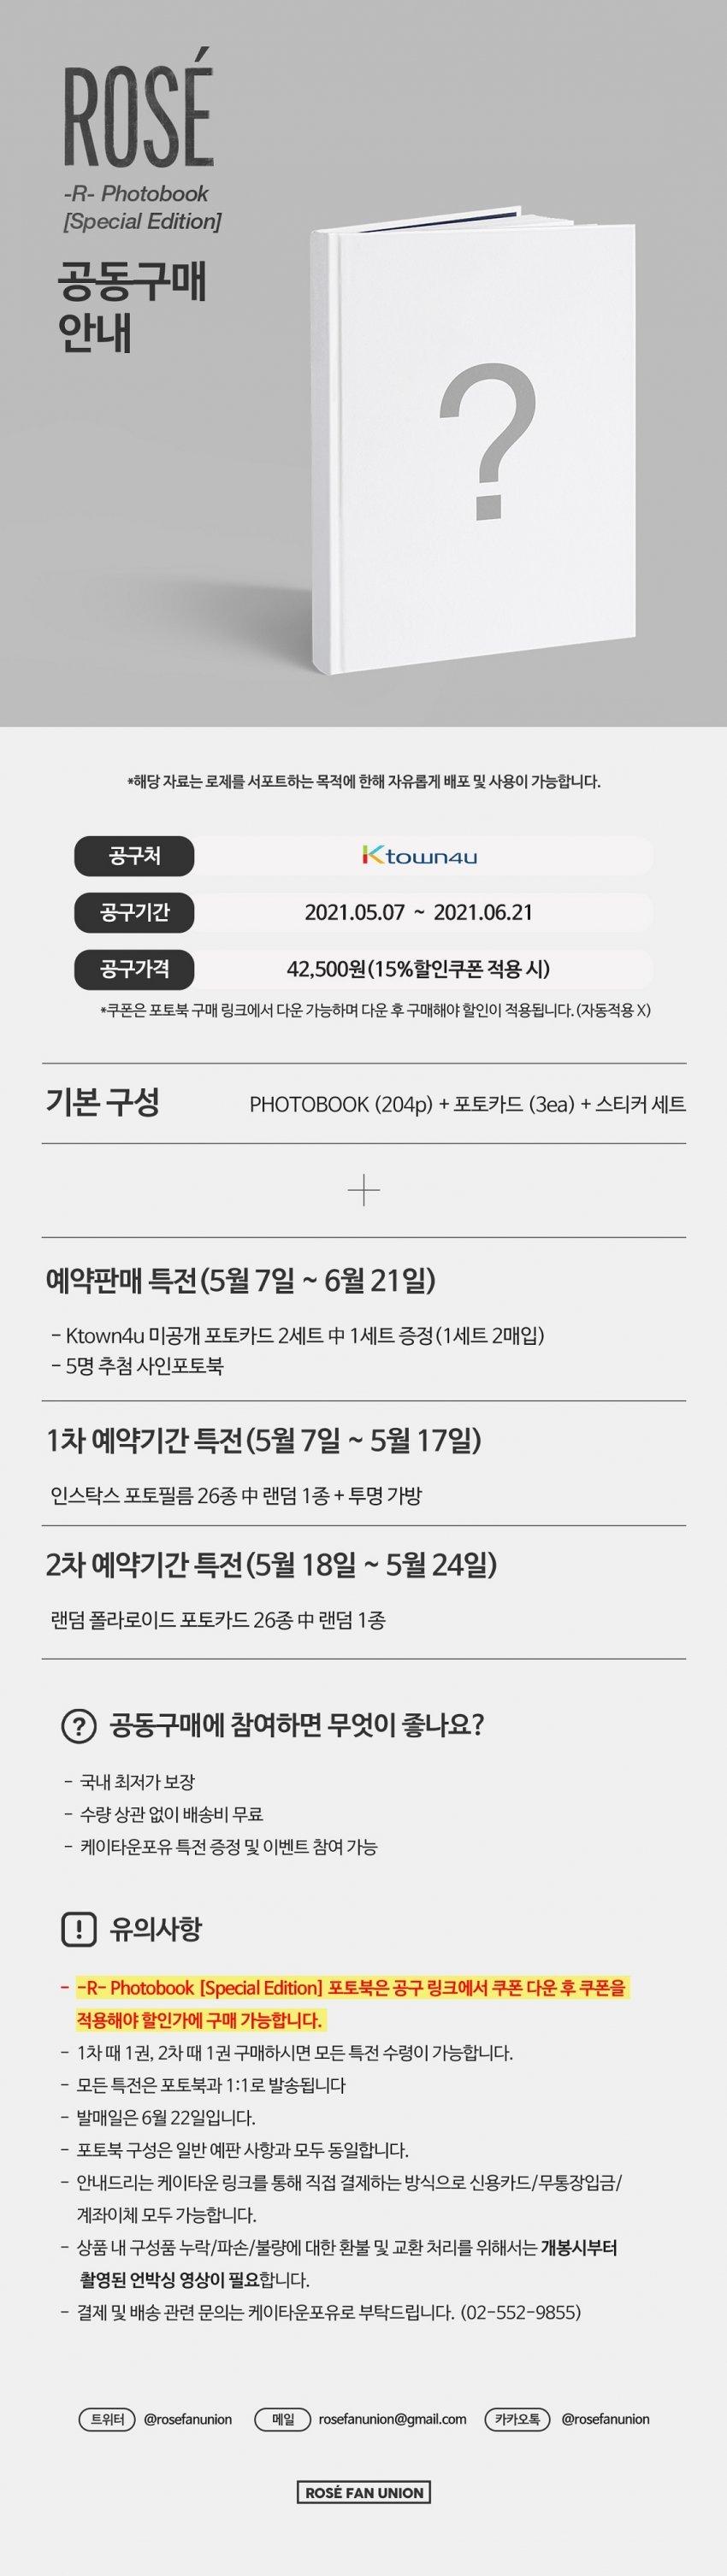 viewimage.php?id=2fb1d125eec231a865&no=24b0d769e1d32ca73fec81fa11d02831b46f6c3837711f4400726d62dc66225b8f78d1b7f7928cb0a5ed8c27104337ce5fbbd8b58088a32c9338ba3474c5cea28390abf017838dce797e04f586845456cce6a84ebe896215bb703ef8ba3f86f0320e4cecd882042f27